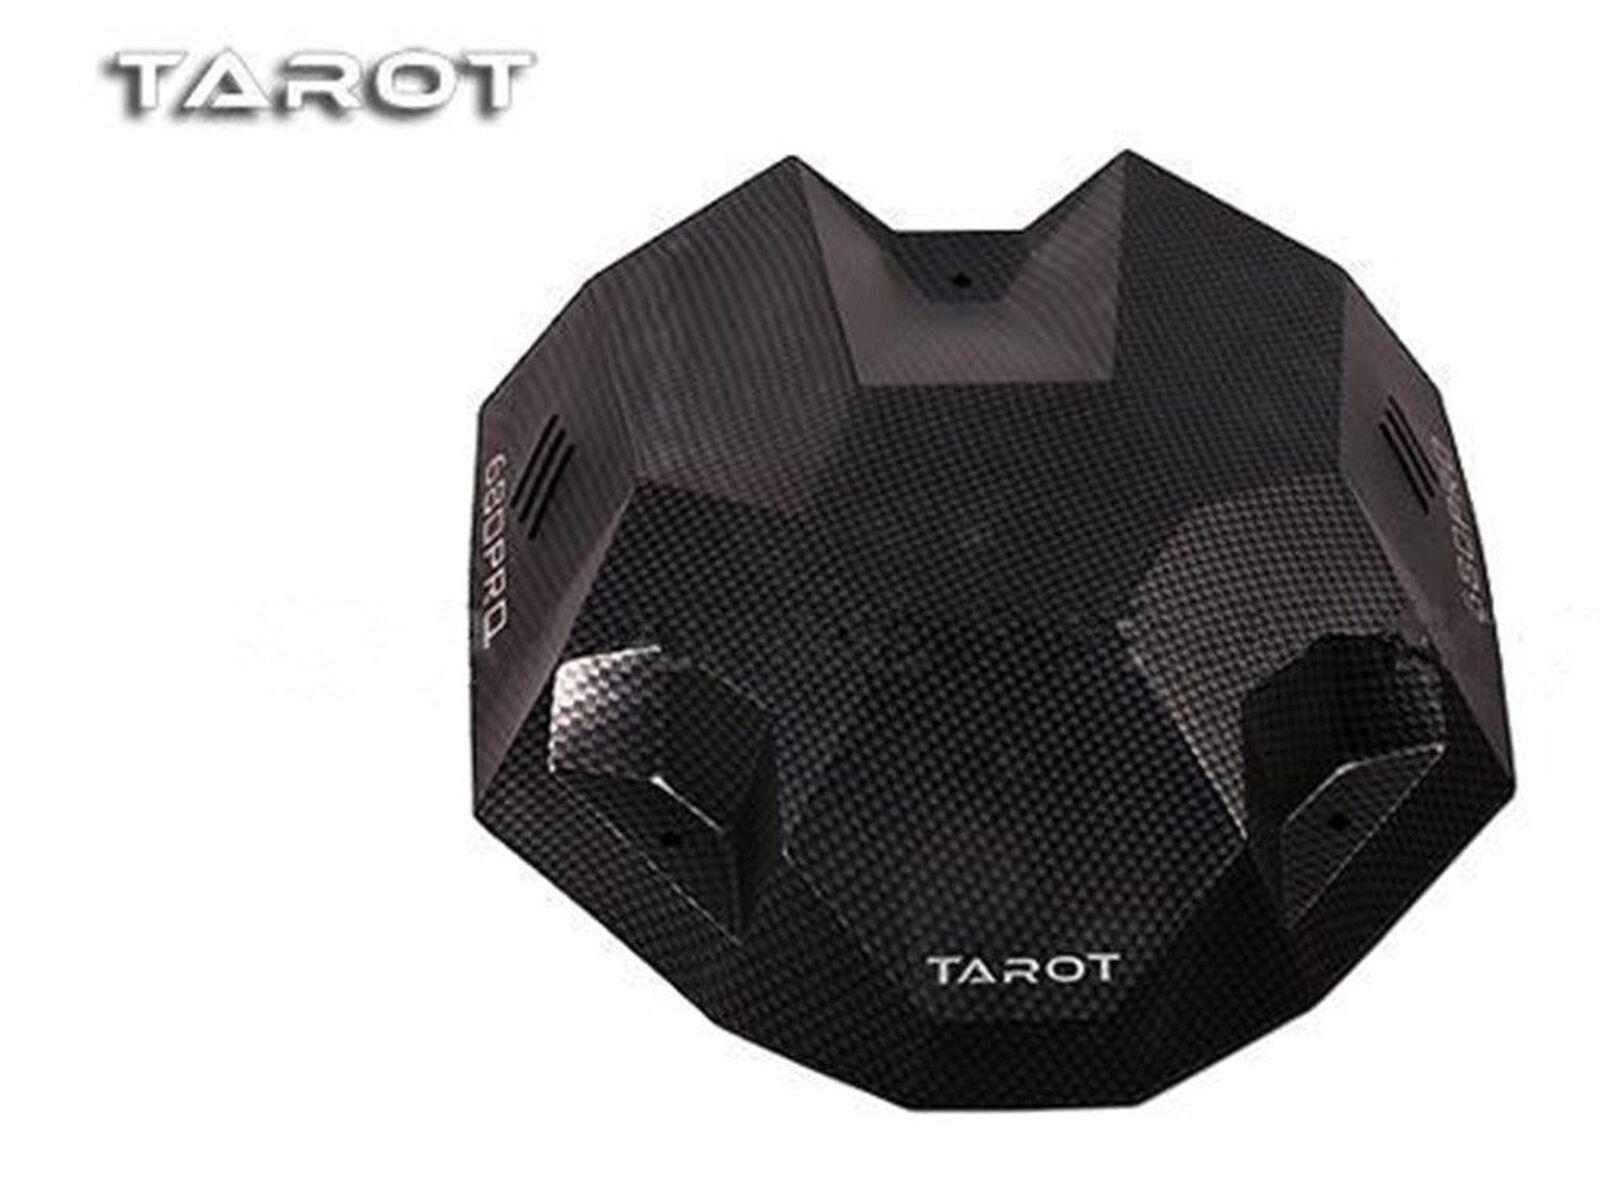 Tared TL2851 680PRO Carbon Fiber Pattern Canopy Hood Head Cover New